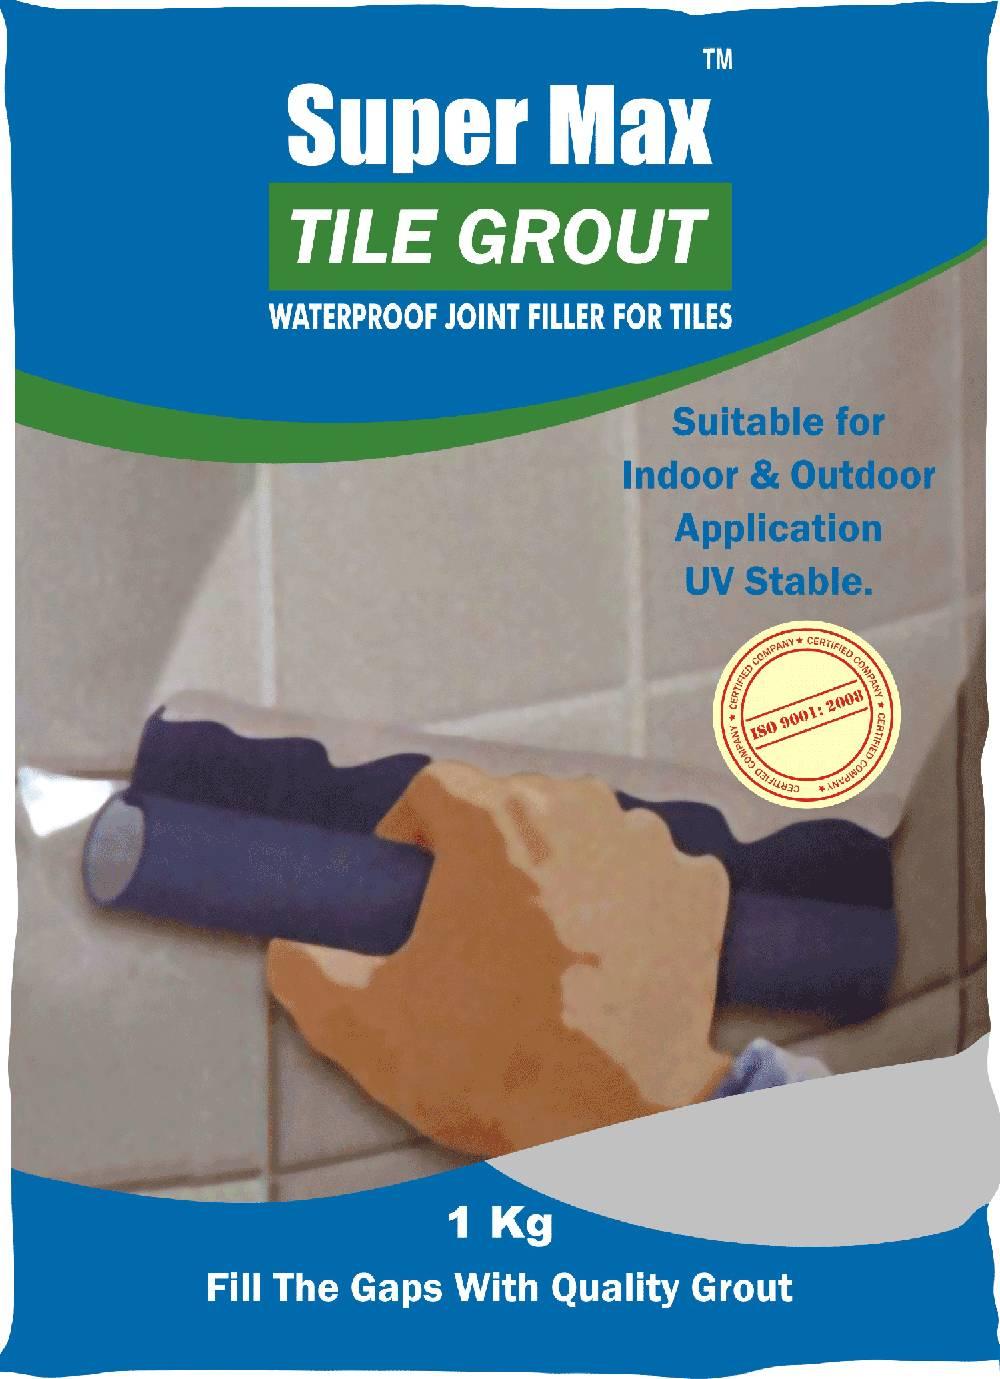 Tiles Joint Filler : Supermax tile grout conchem pvt ltd